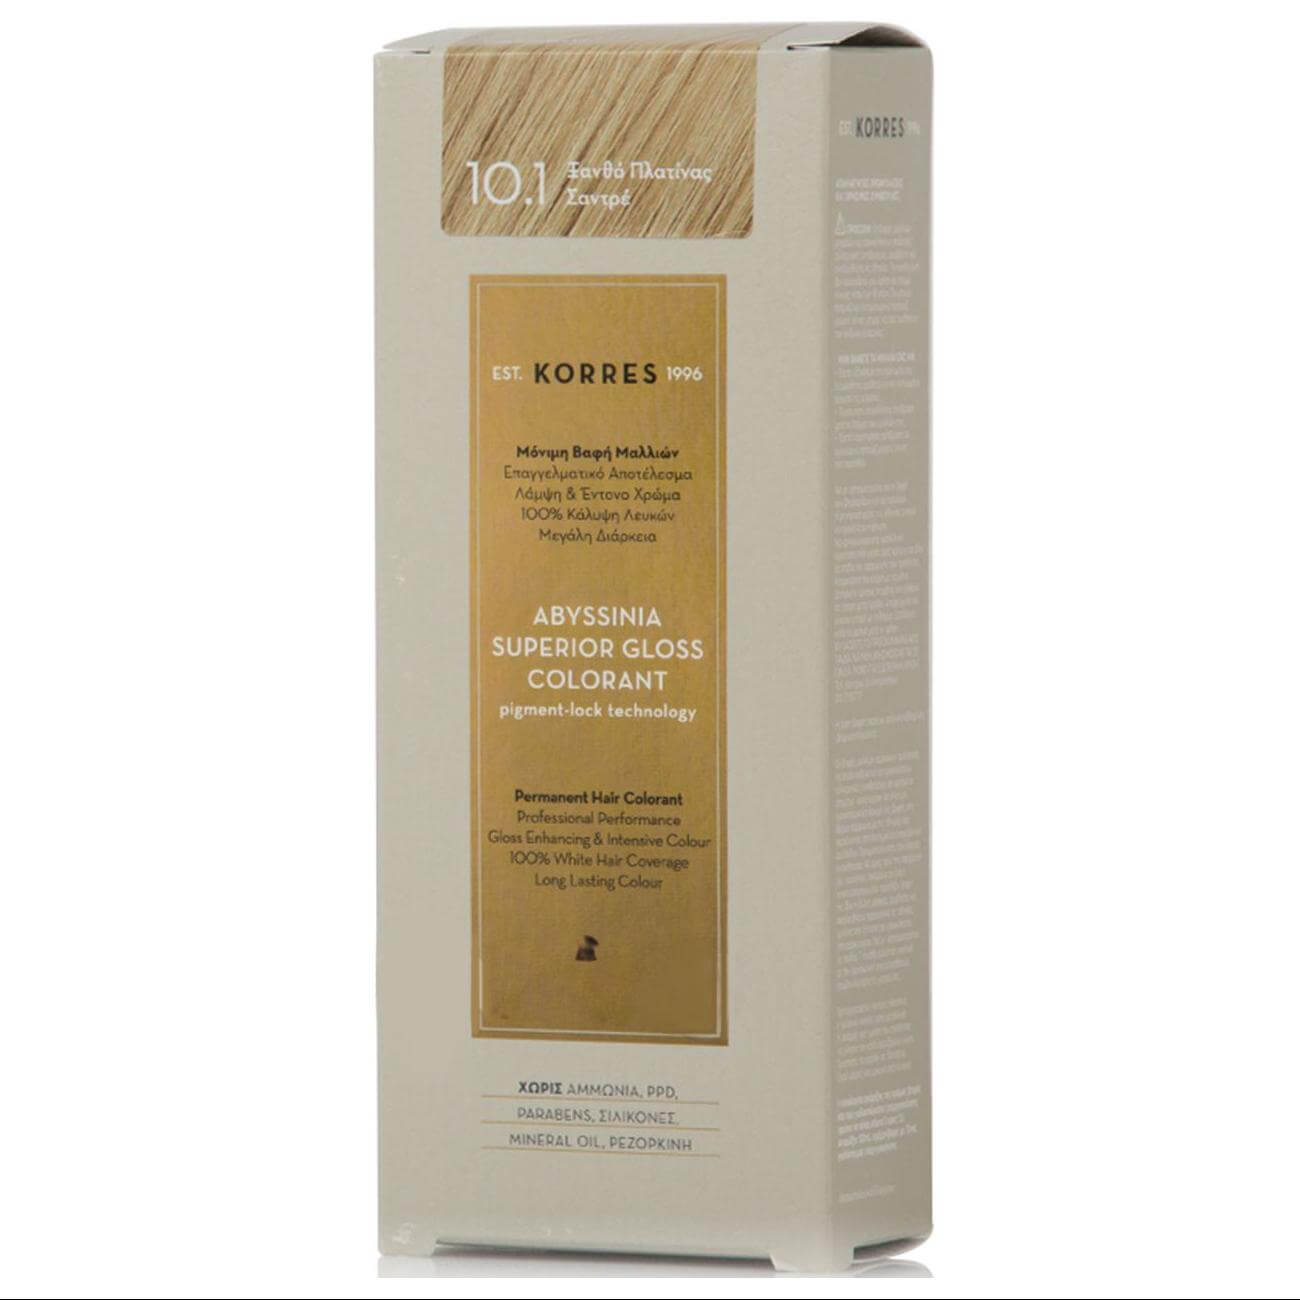 Korres Abyssinia Superior Gloss Colorant Επαγγελματικό Αποτέλεσμα Λάμψη & Έντονο υγιεινή   μαλλιά   βαφές   ρεφλέ